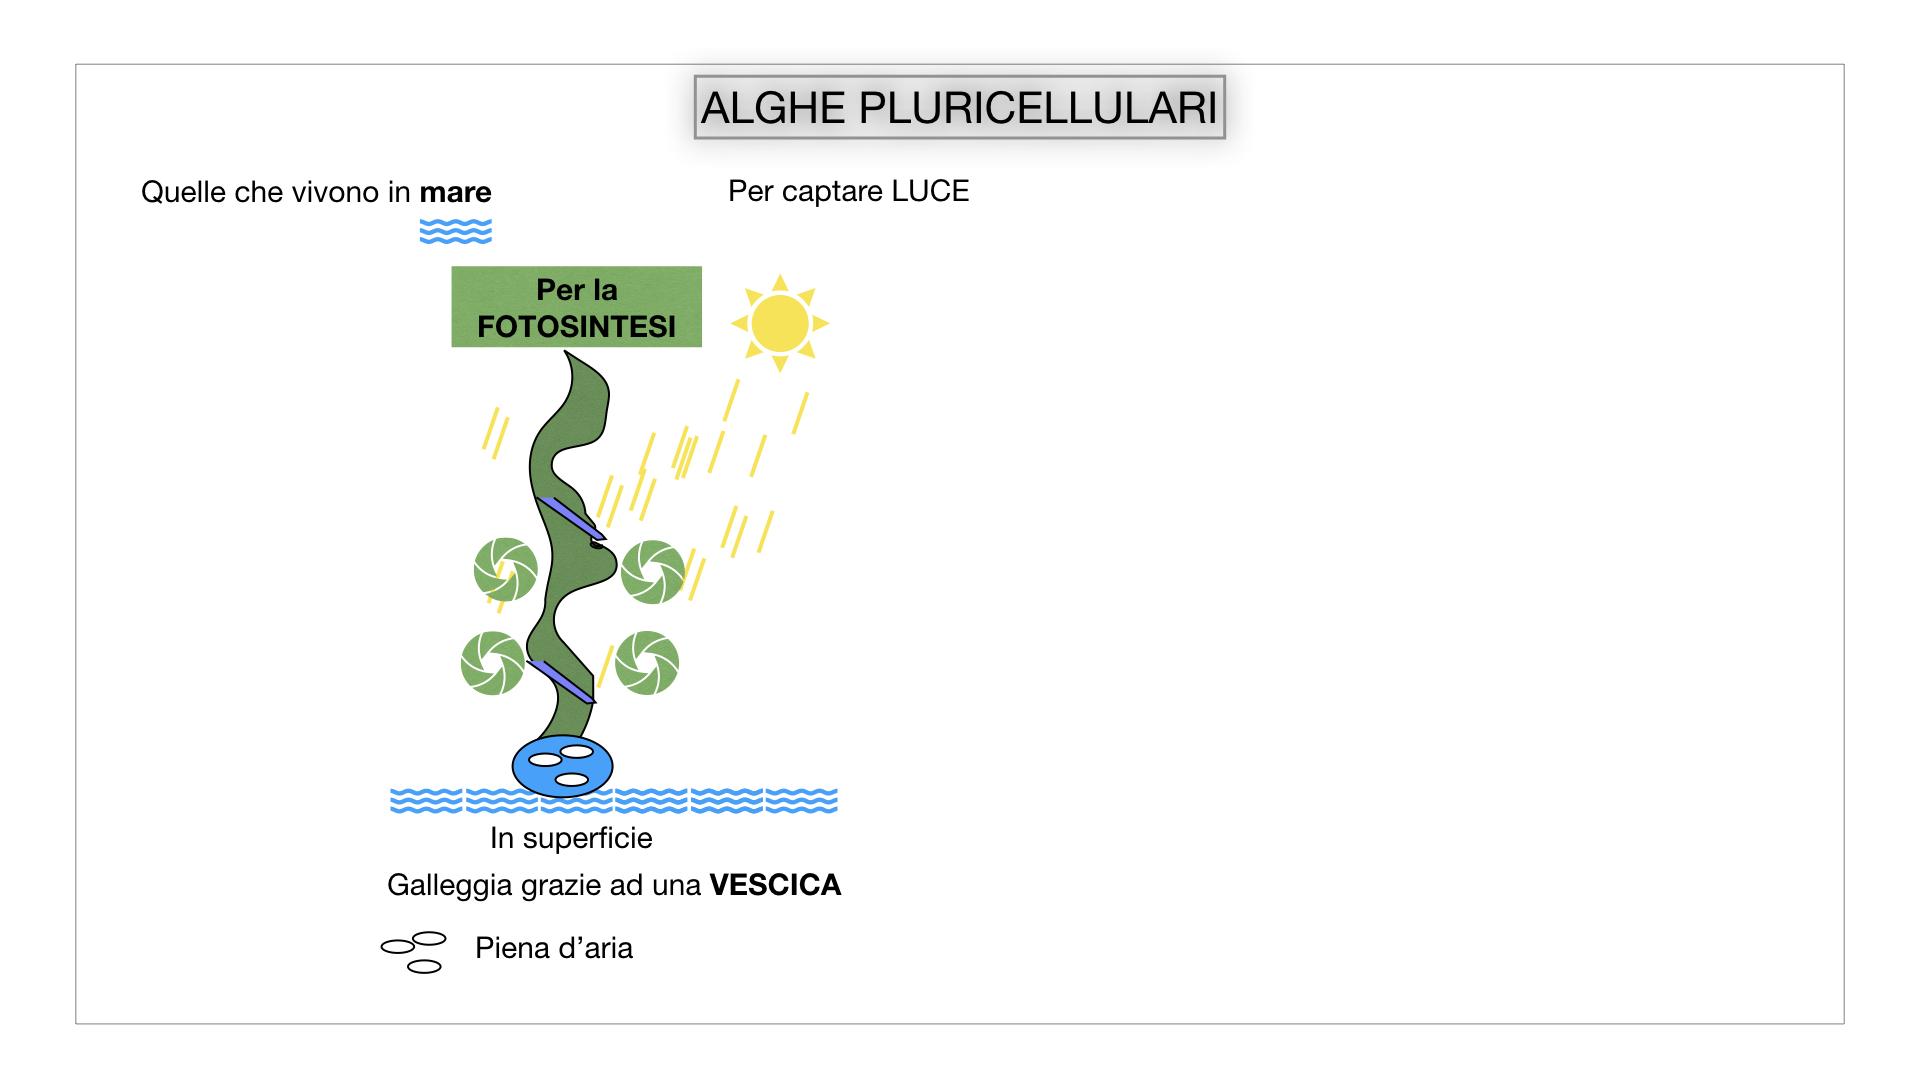 8. alghe uni_pluri_cellulari_SIMULAZIONE.036